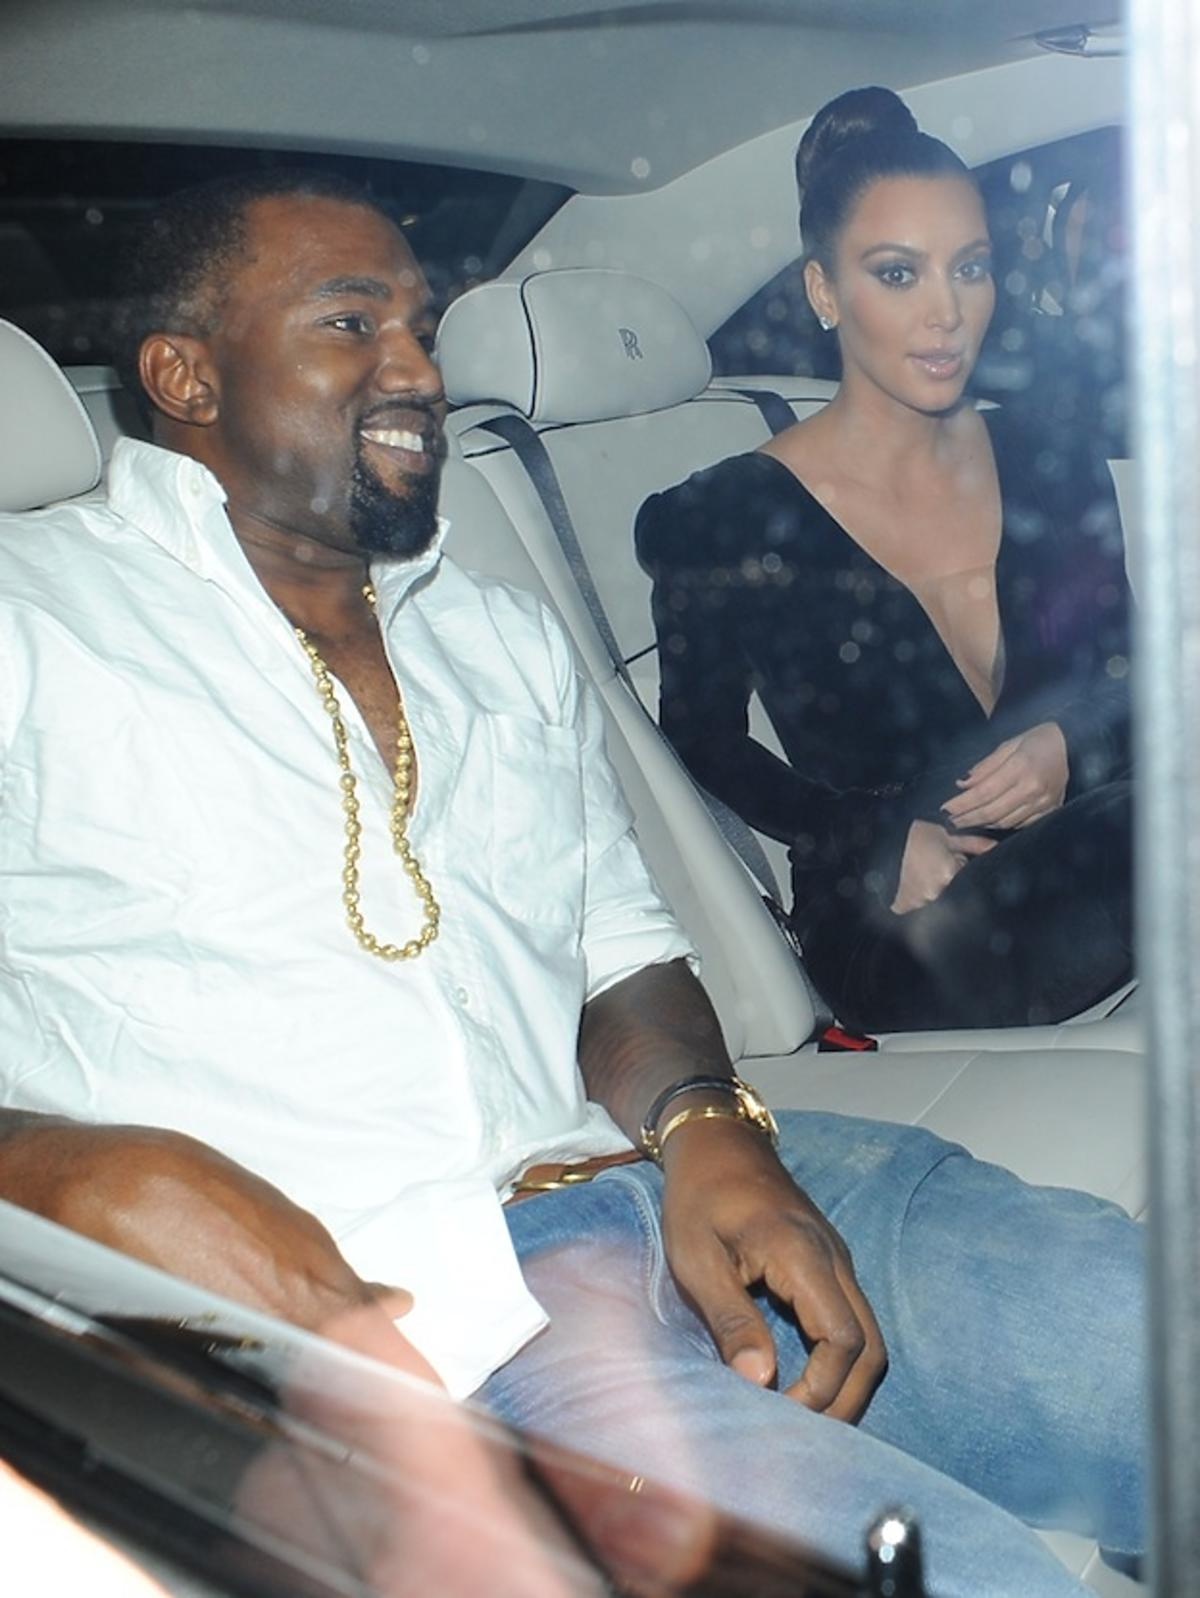 All-ONS_1453468-Kim_Kardashian_Kanye_West.jpg